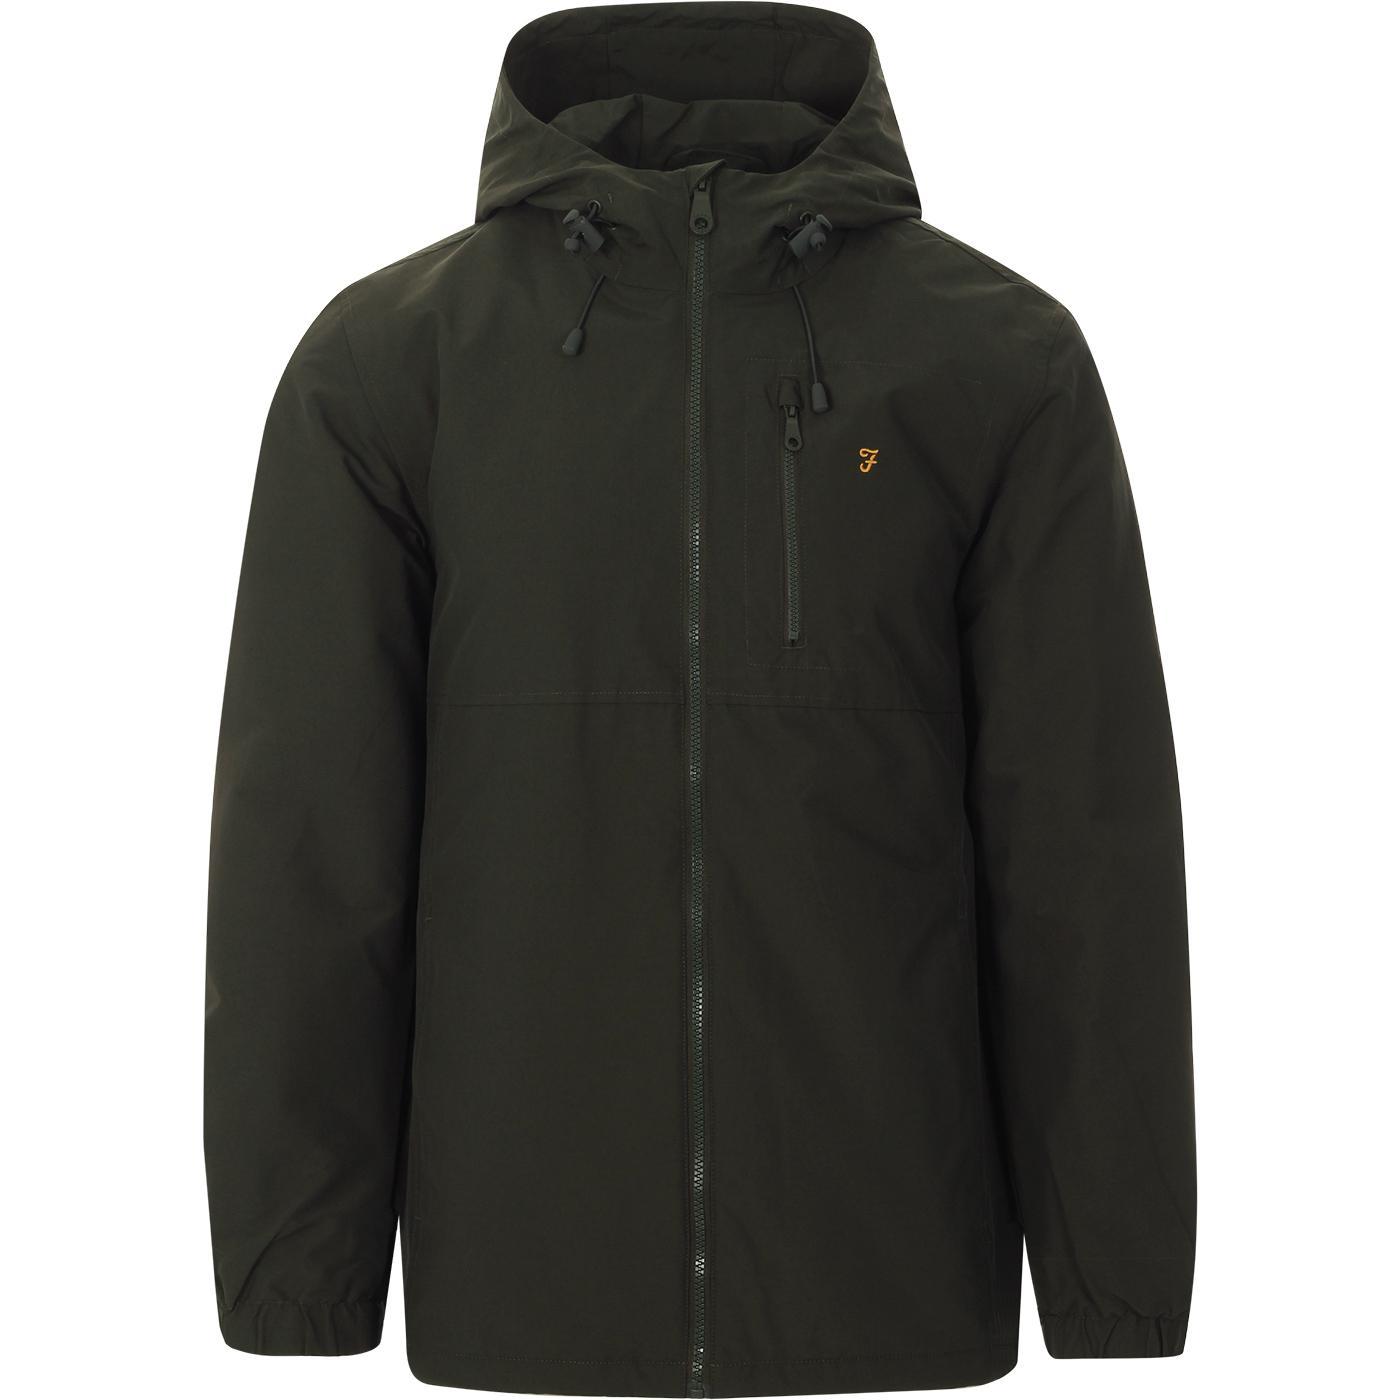 Westchester FARAH Retro Hooded Jacket (Evergreen)